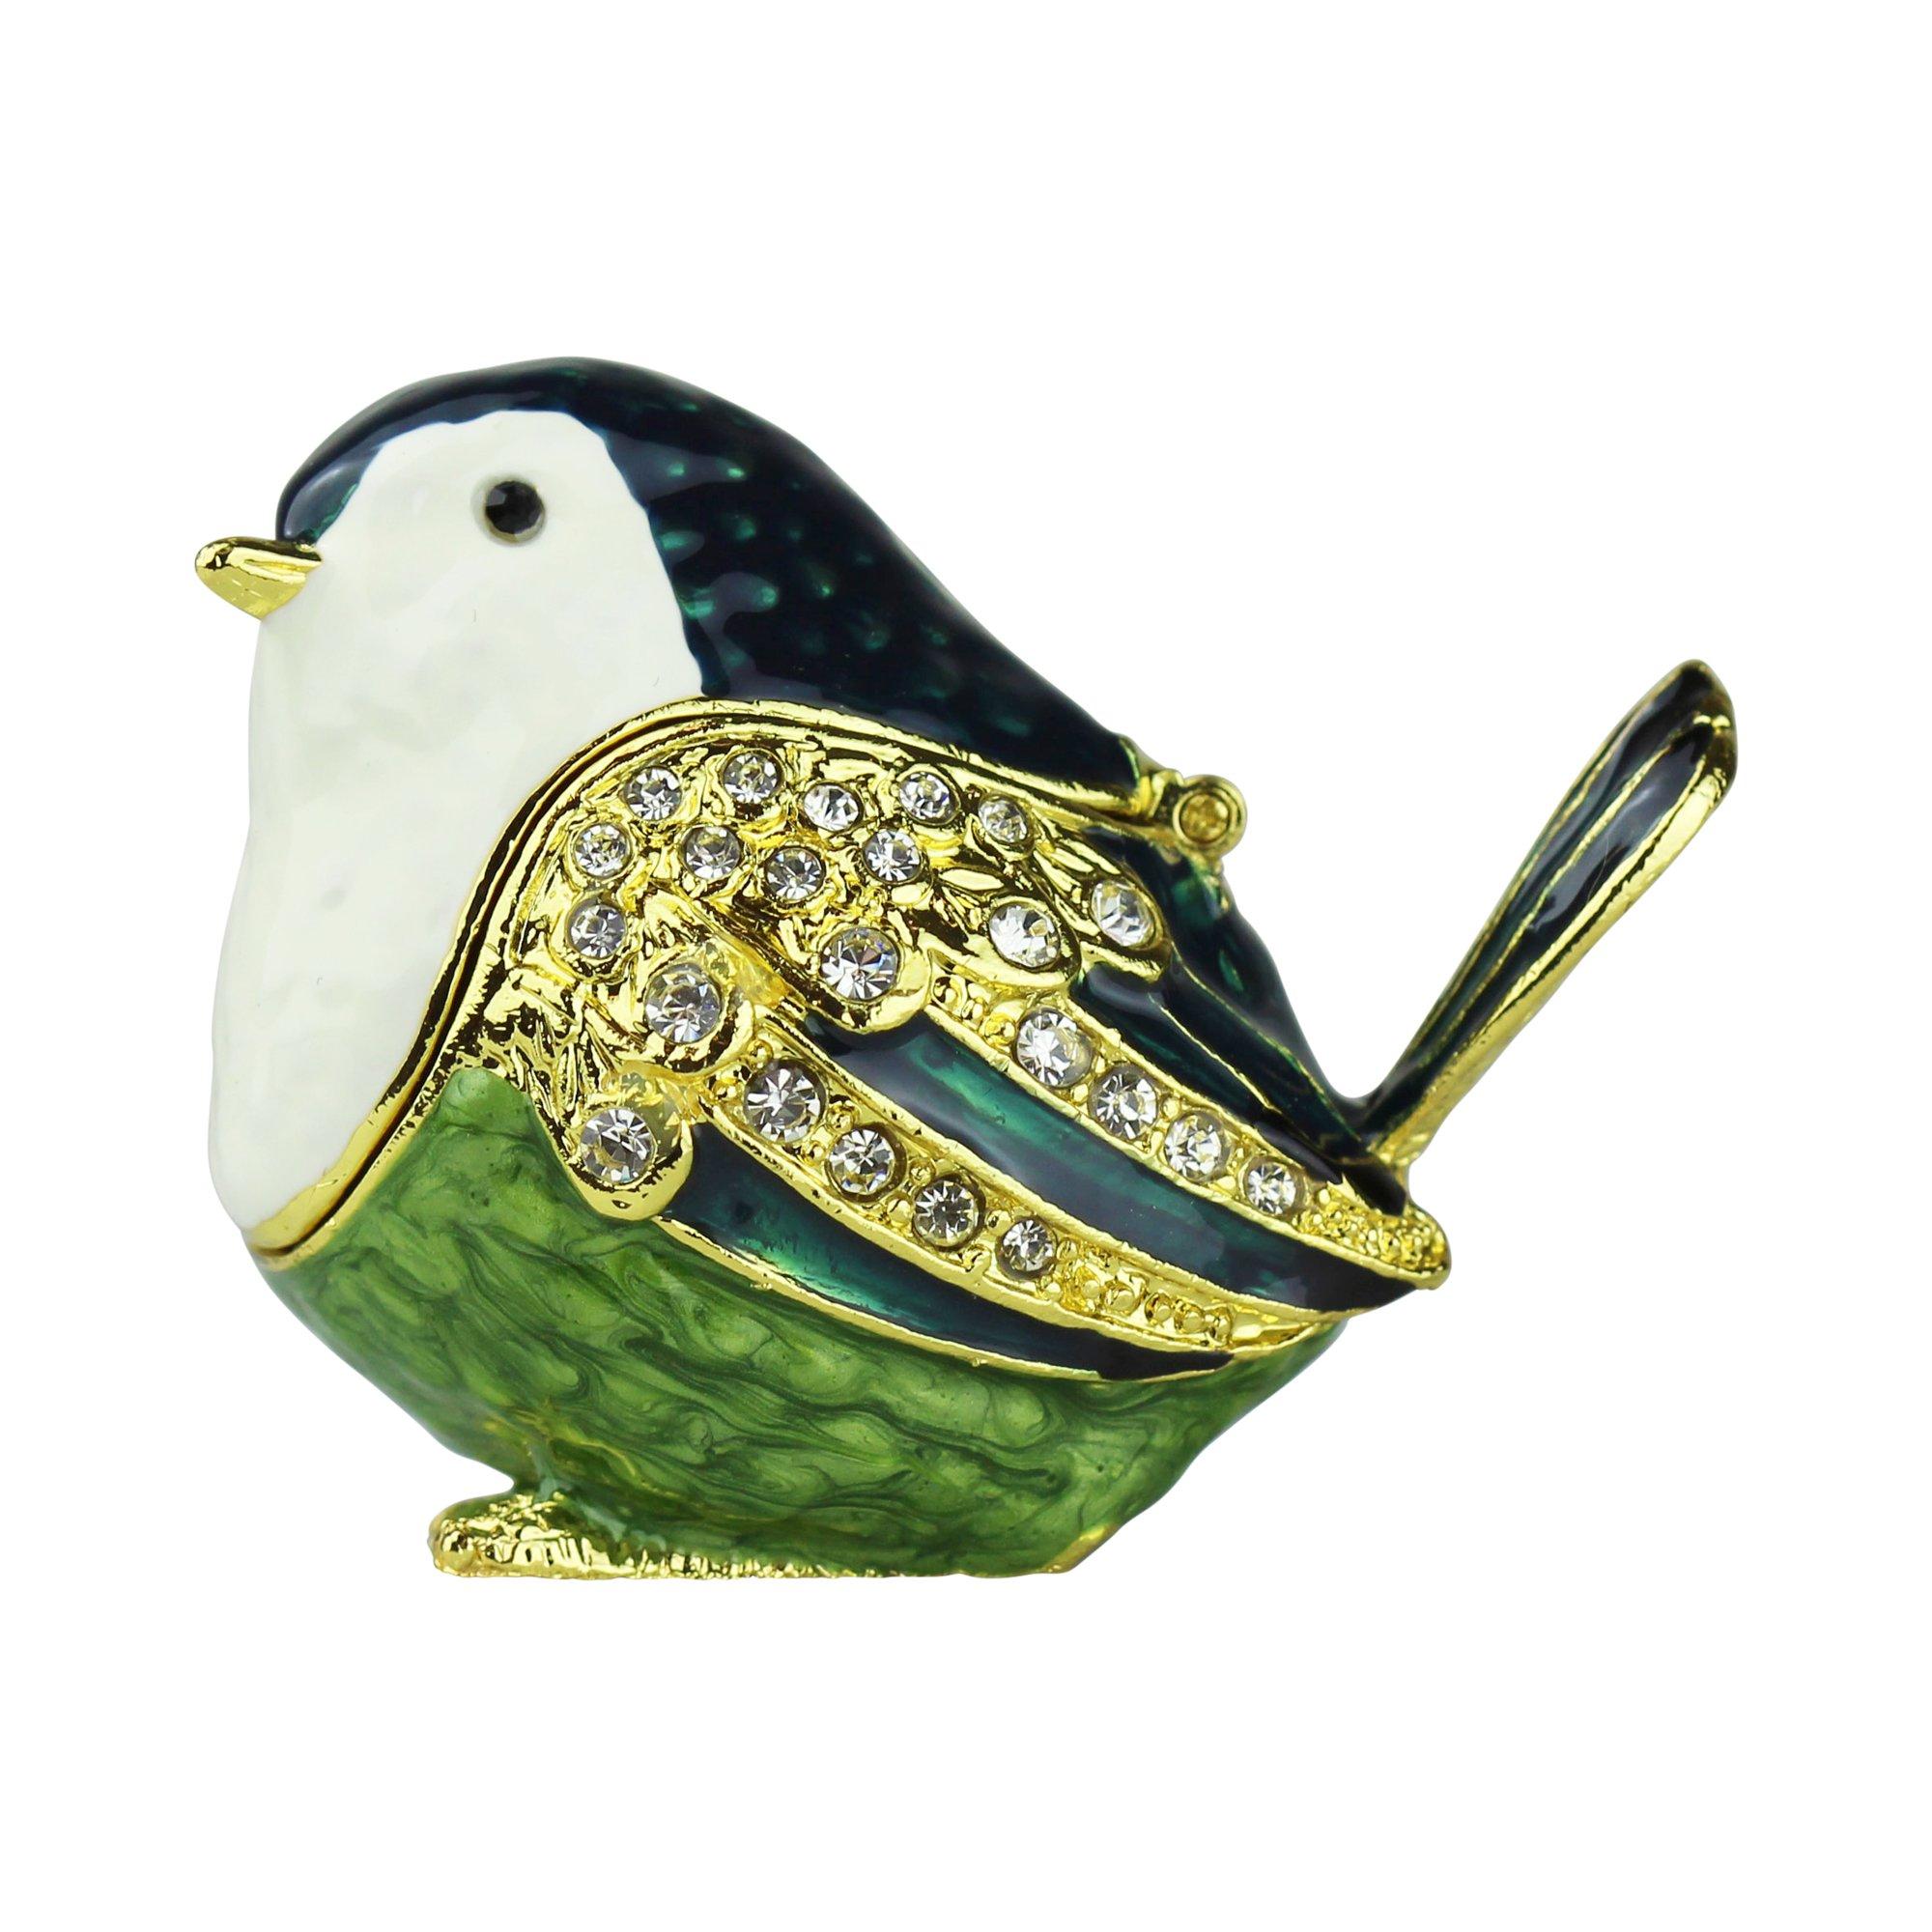 Image of Pretty Green Little Sparrow Bird Trinket Box